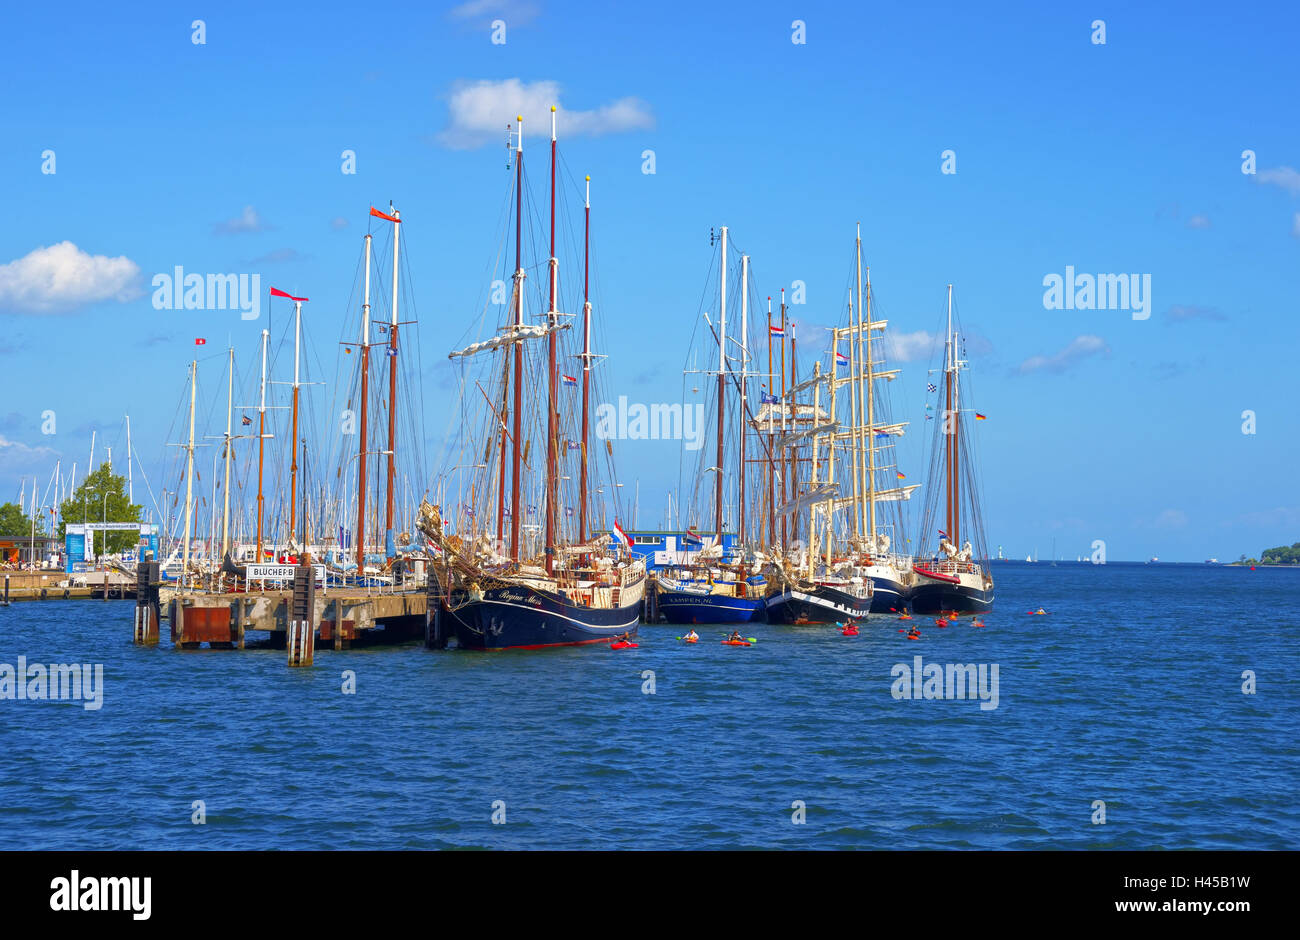 Germany, Schleswig - Holstein, Kiel, Oslo quay, sailboats, - Stock Image